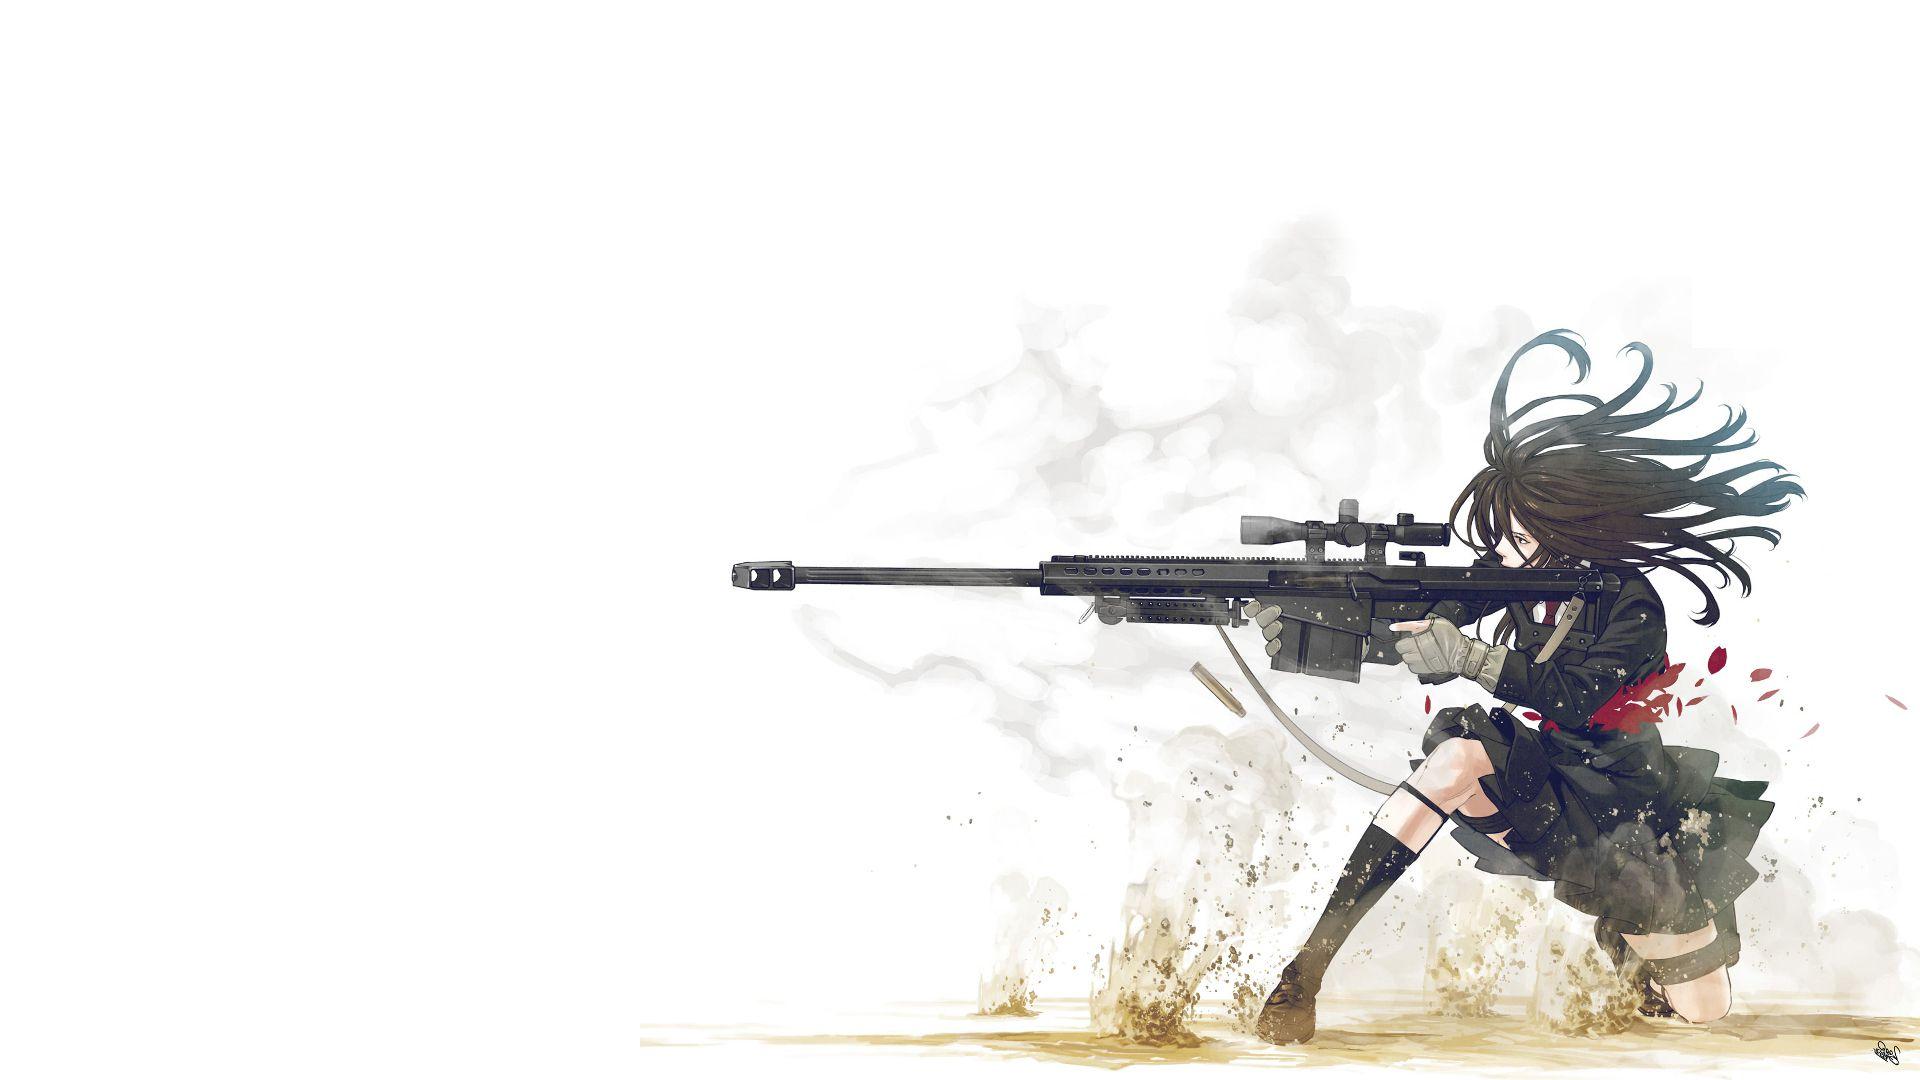 Hd wallpaper anime - Anime Girl With Gun Hd Wallpaper 1920x1080